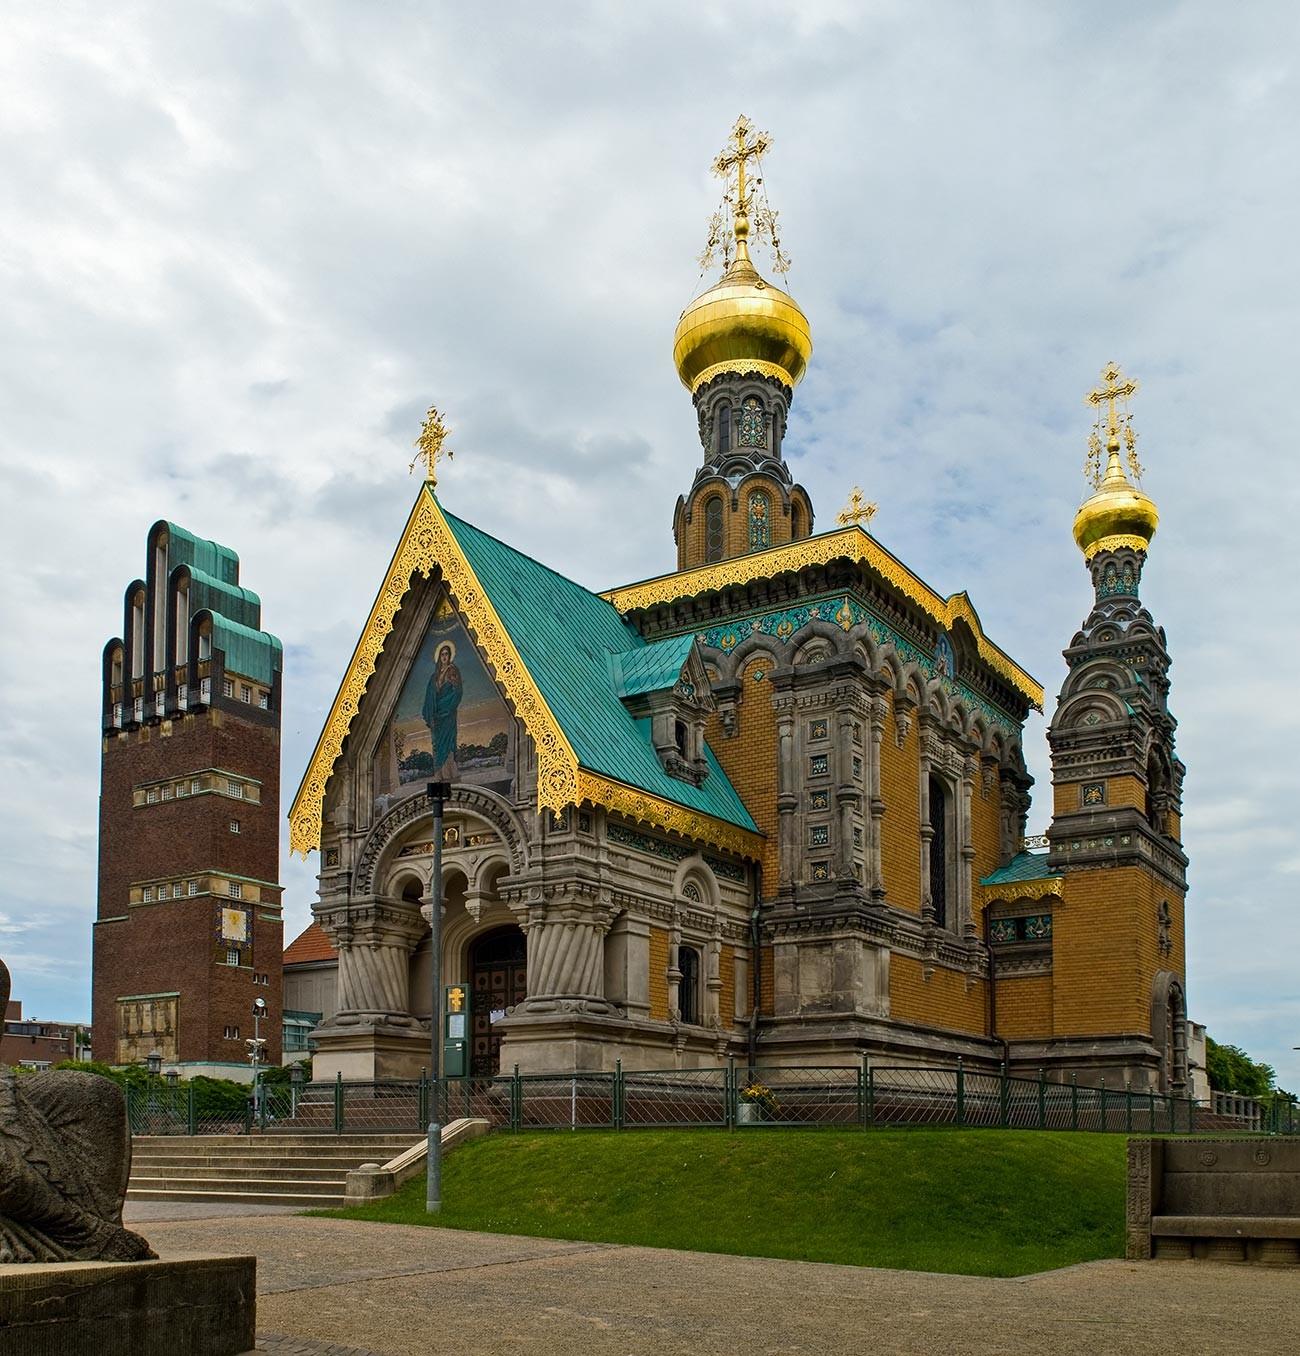 La cappella russa a Darmstadt